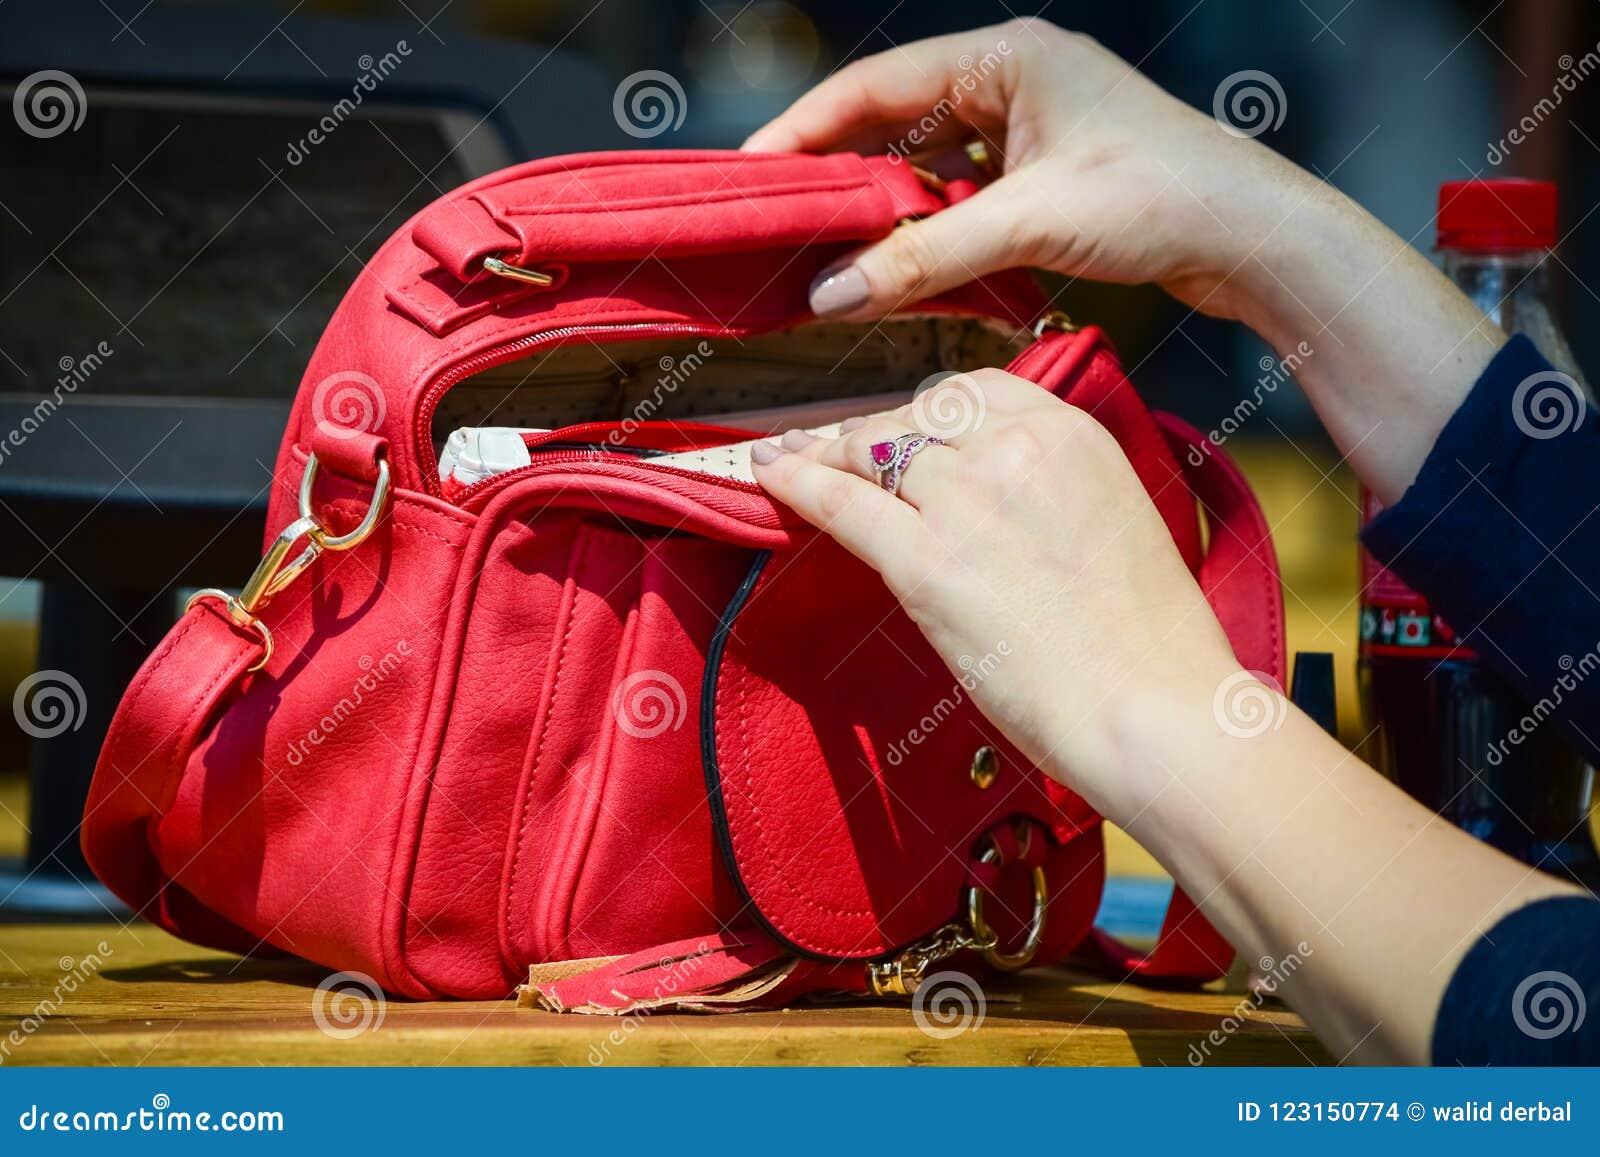 Woman hands opening red handbag